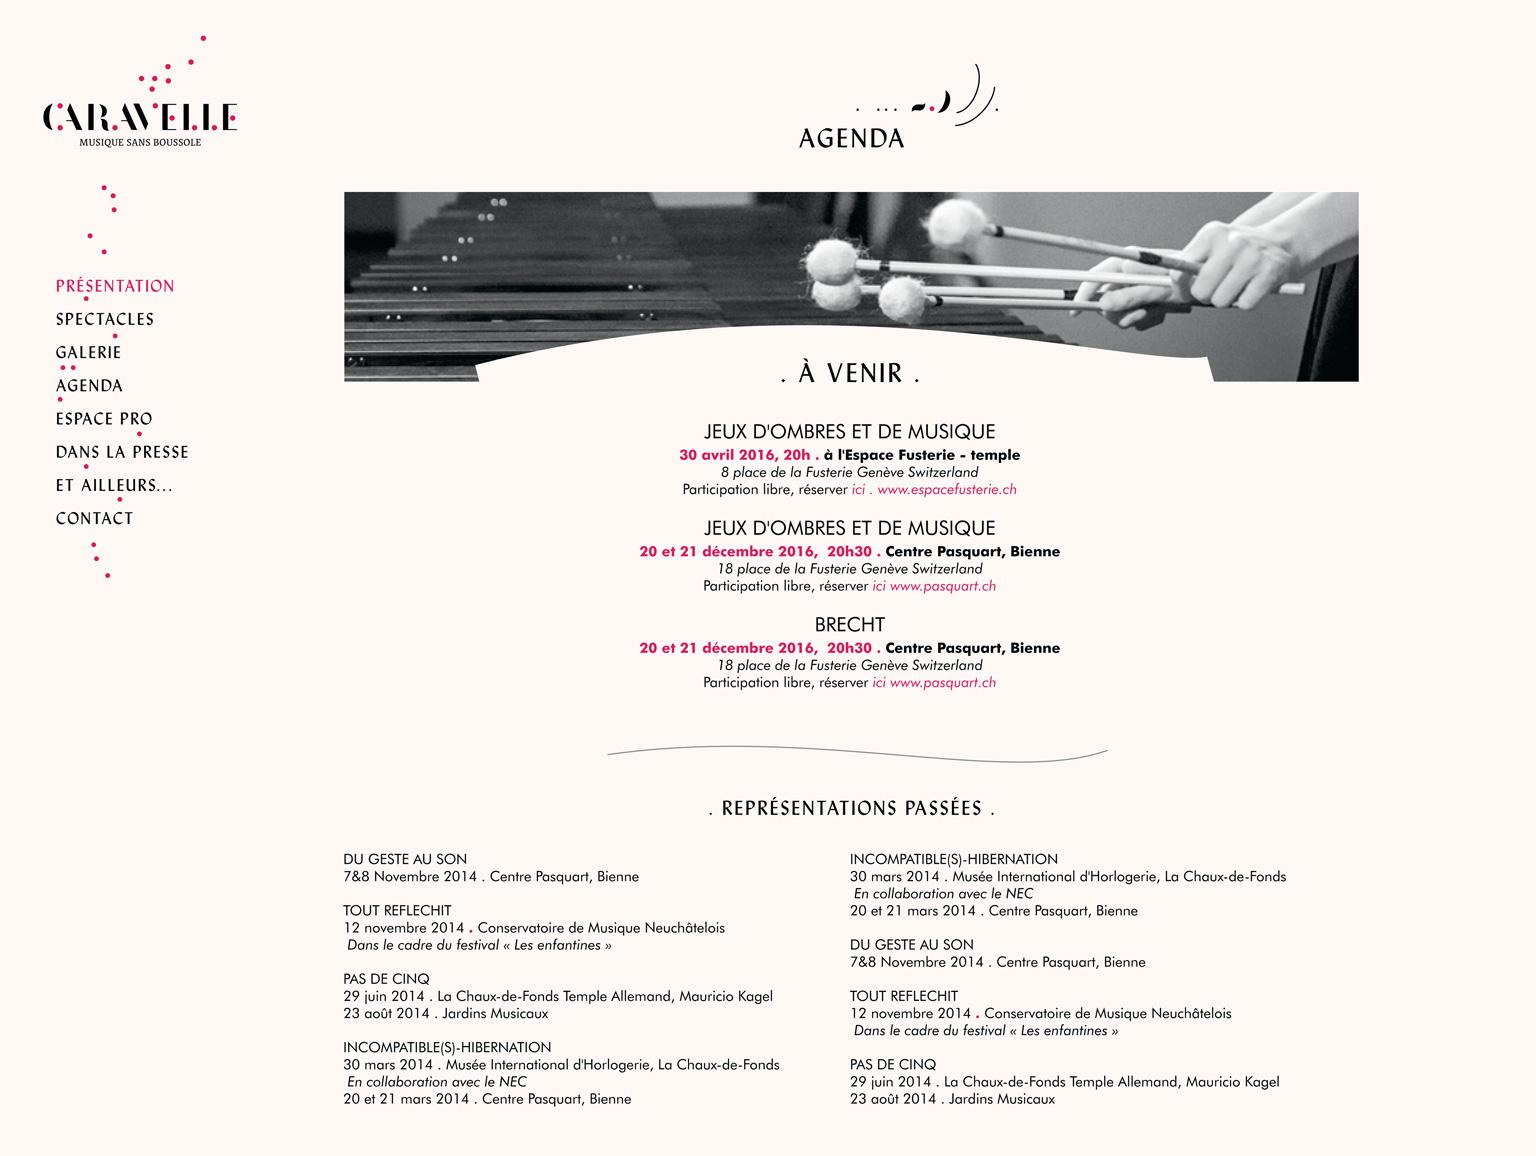 caravelle-agenda